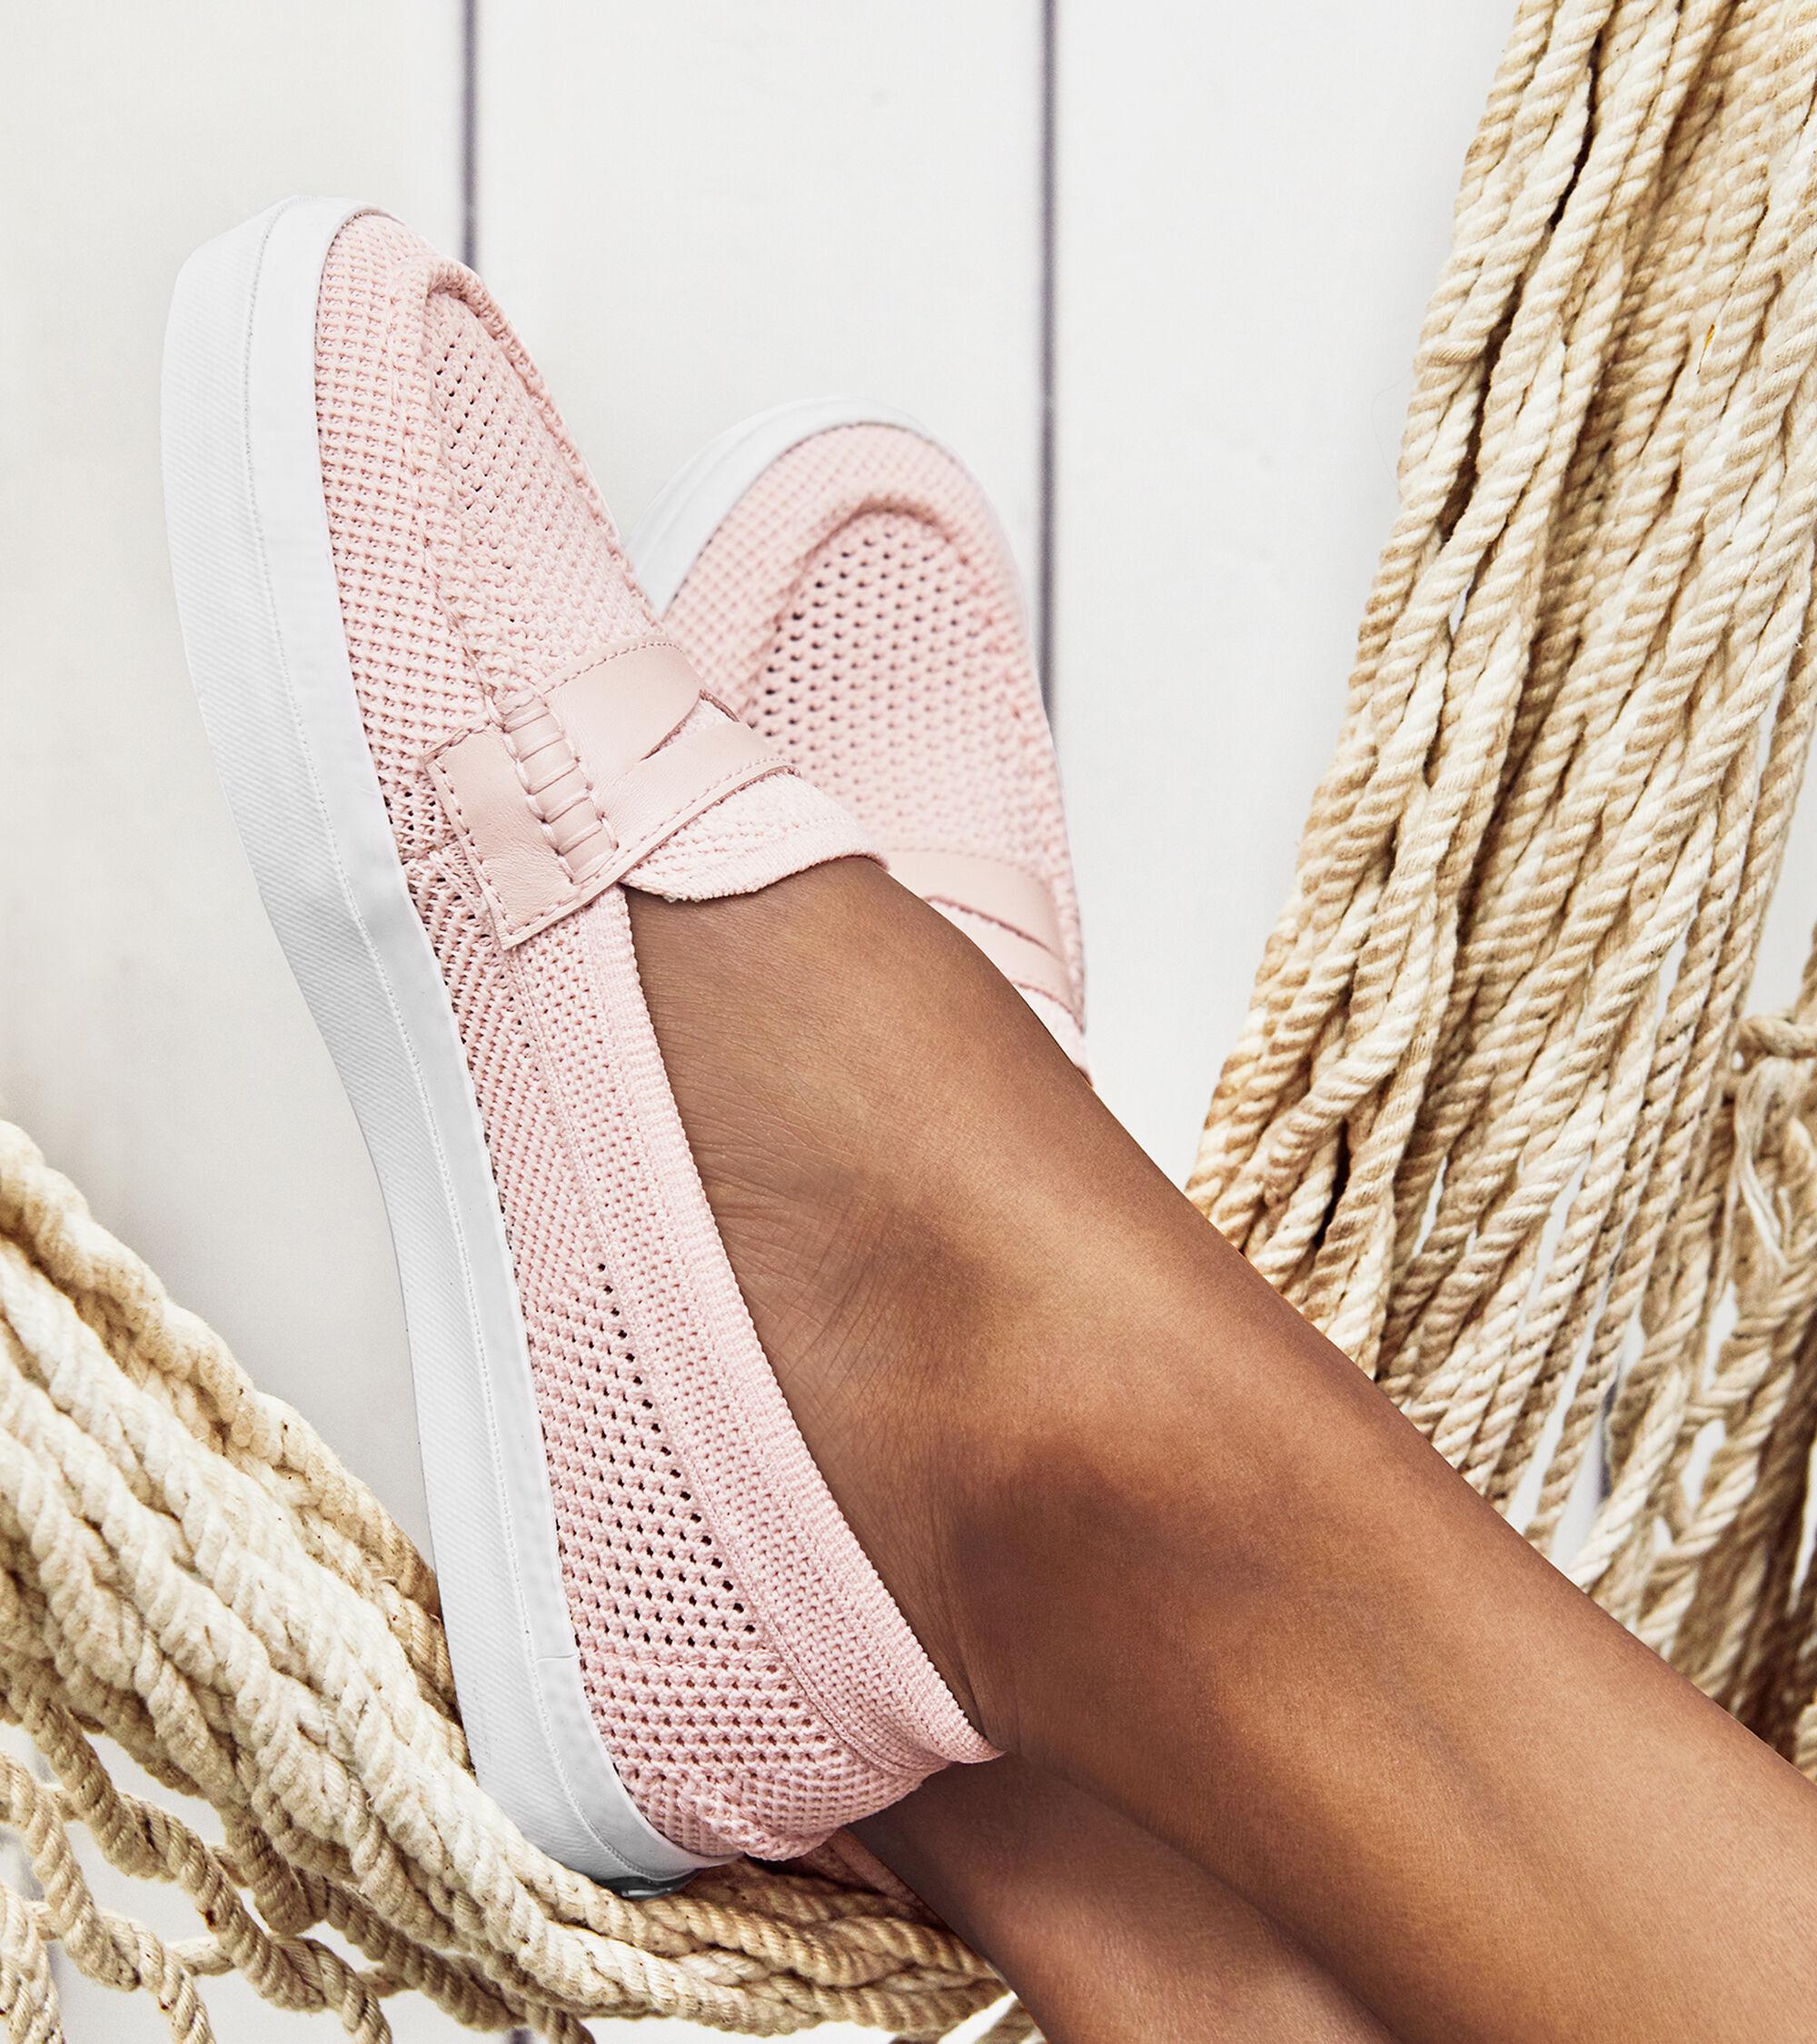 b7f1ac0c2c3 Women s Pinch Weekender LX Stitchlite Loafers in Pink